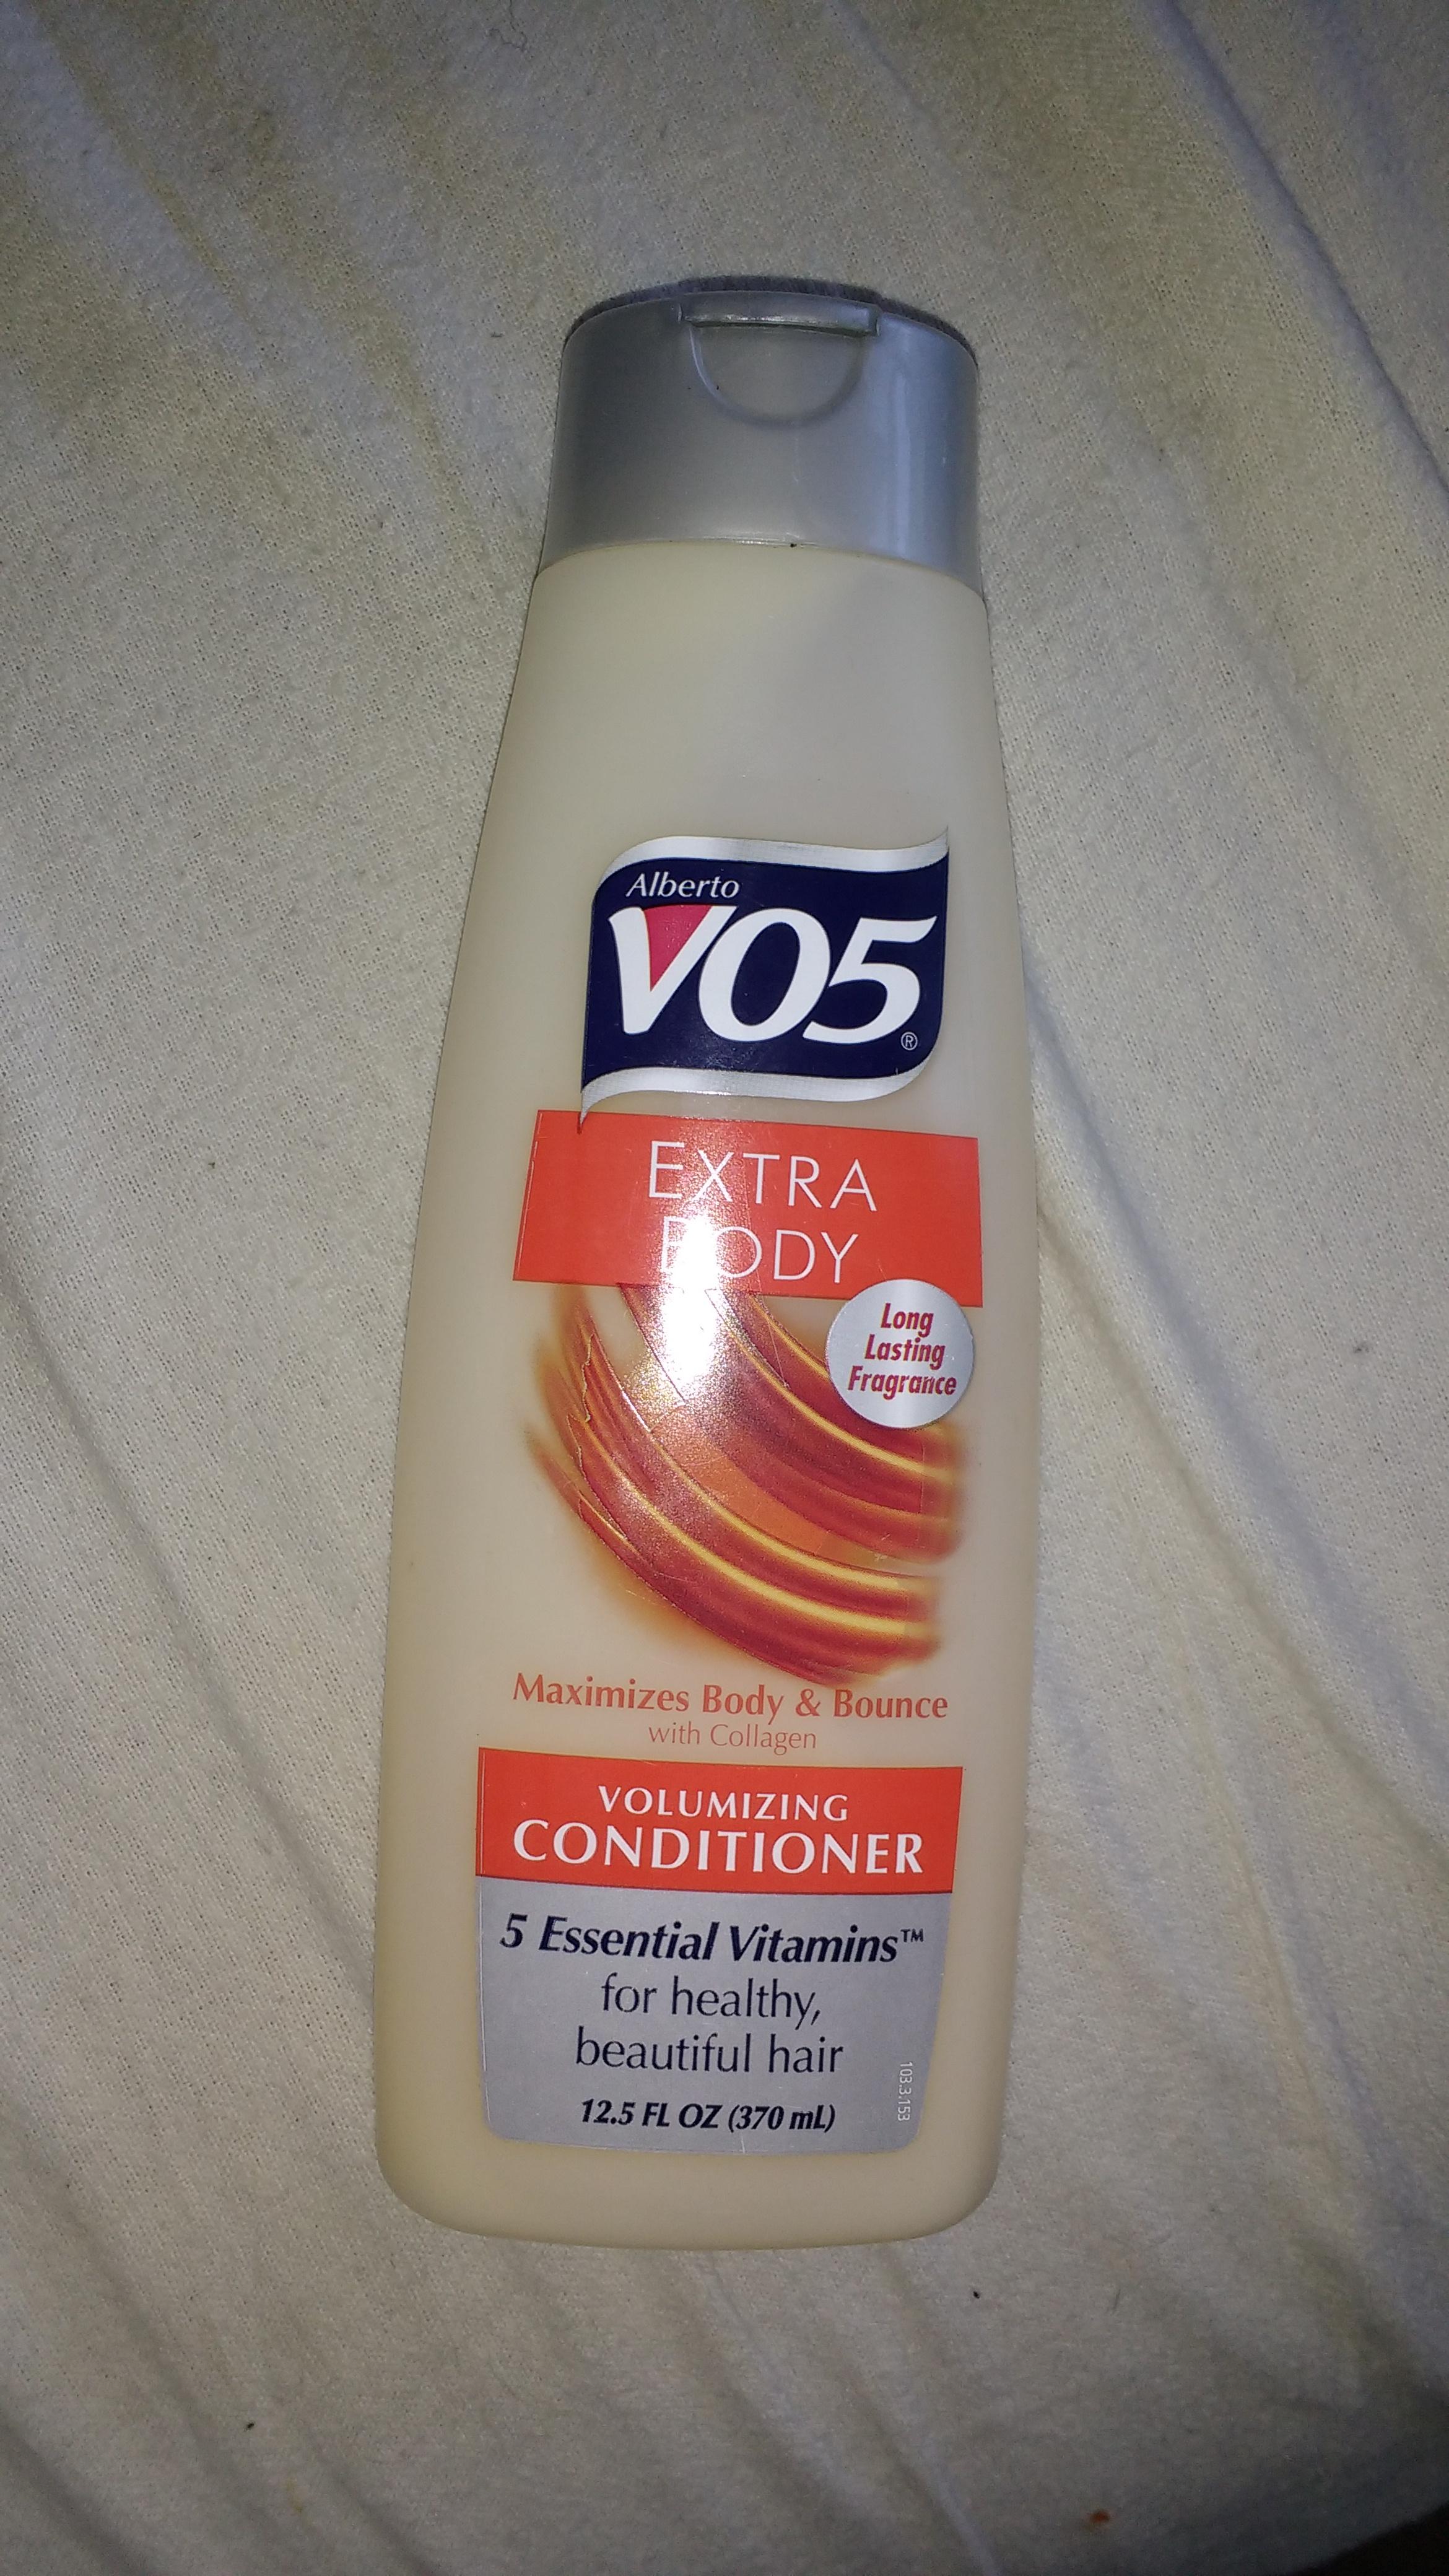 Alberto VO5® Extra Body Volumizing Conditioner uploaded by June H.